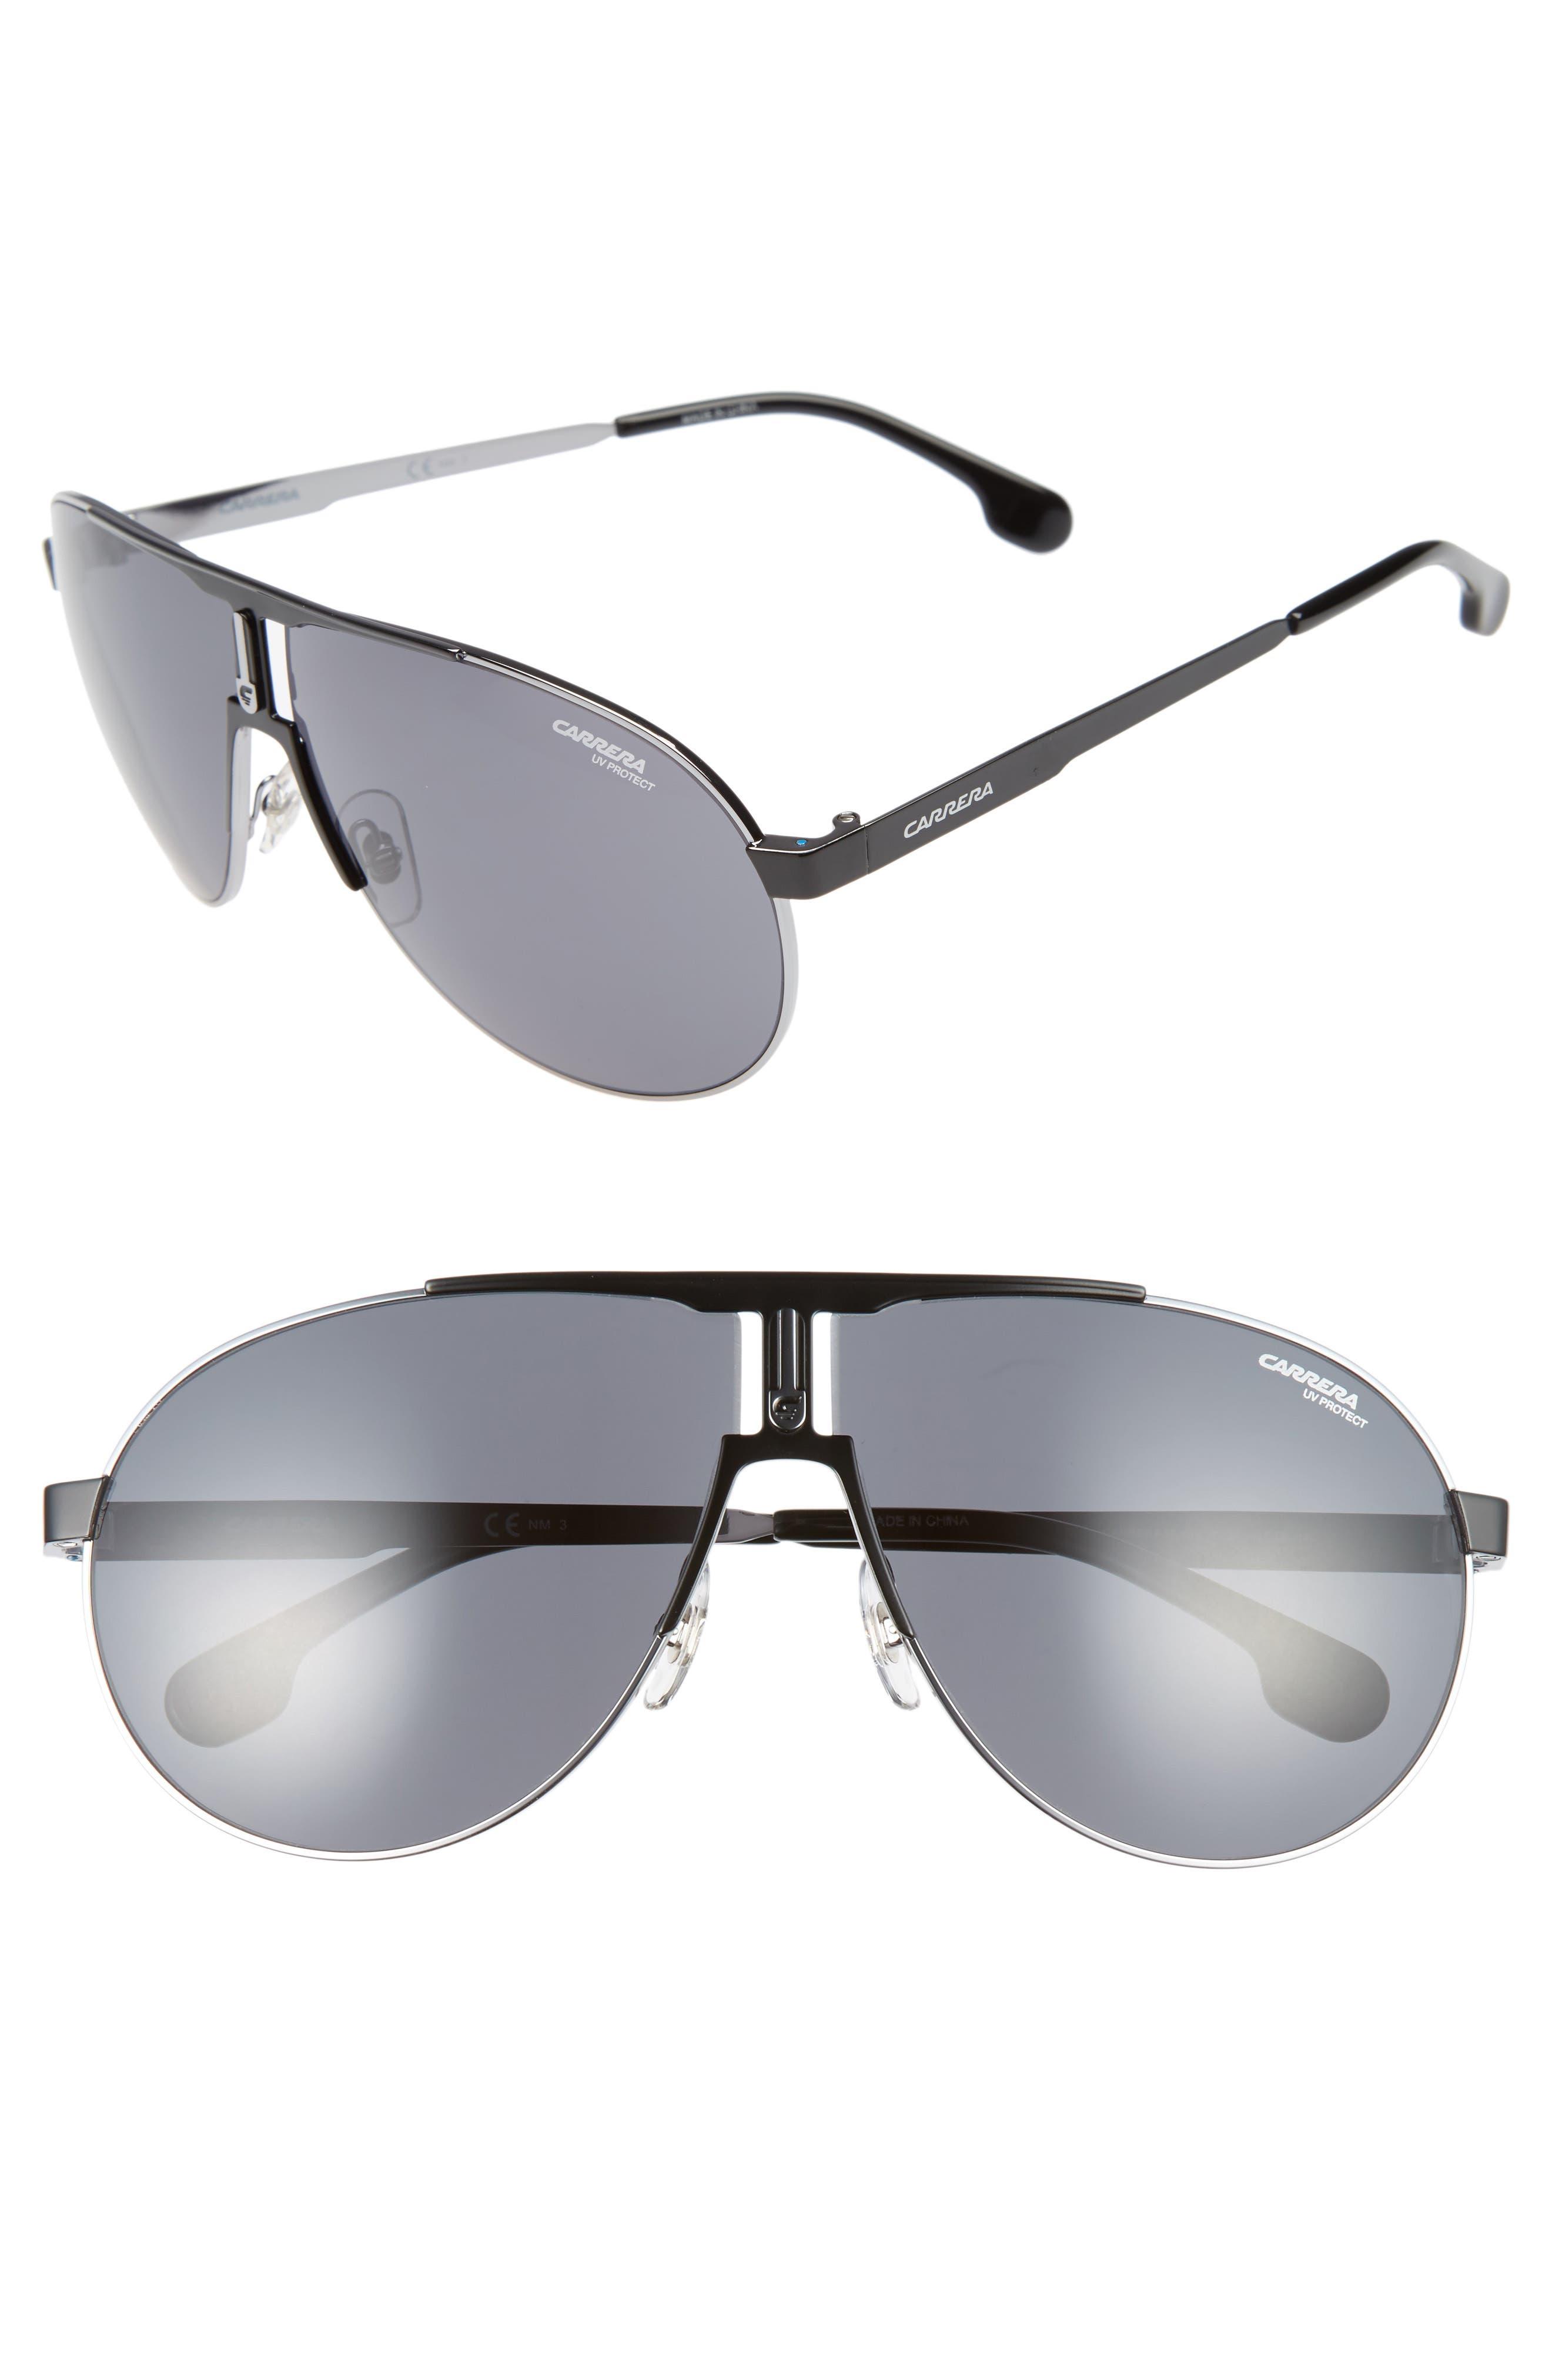 Carrera Eyewear 66mm Sunglasses